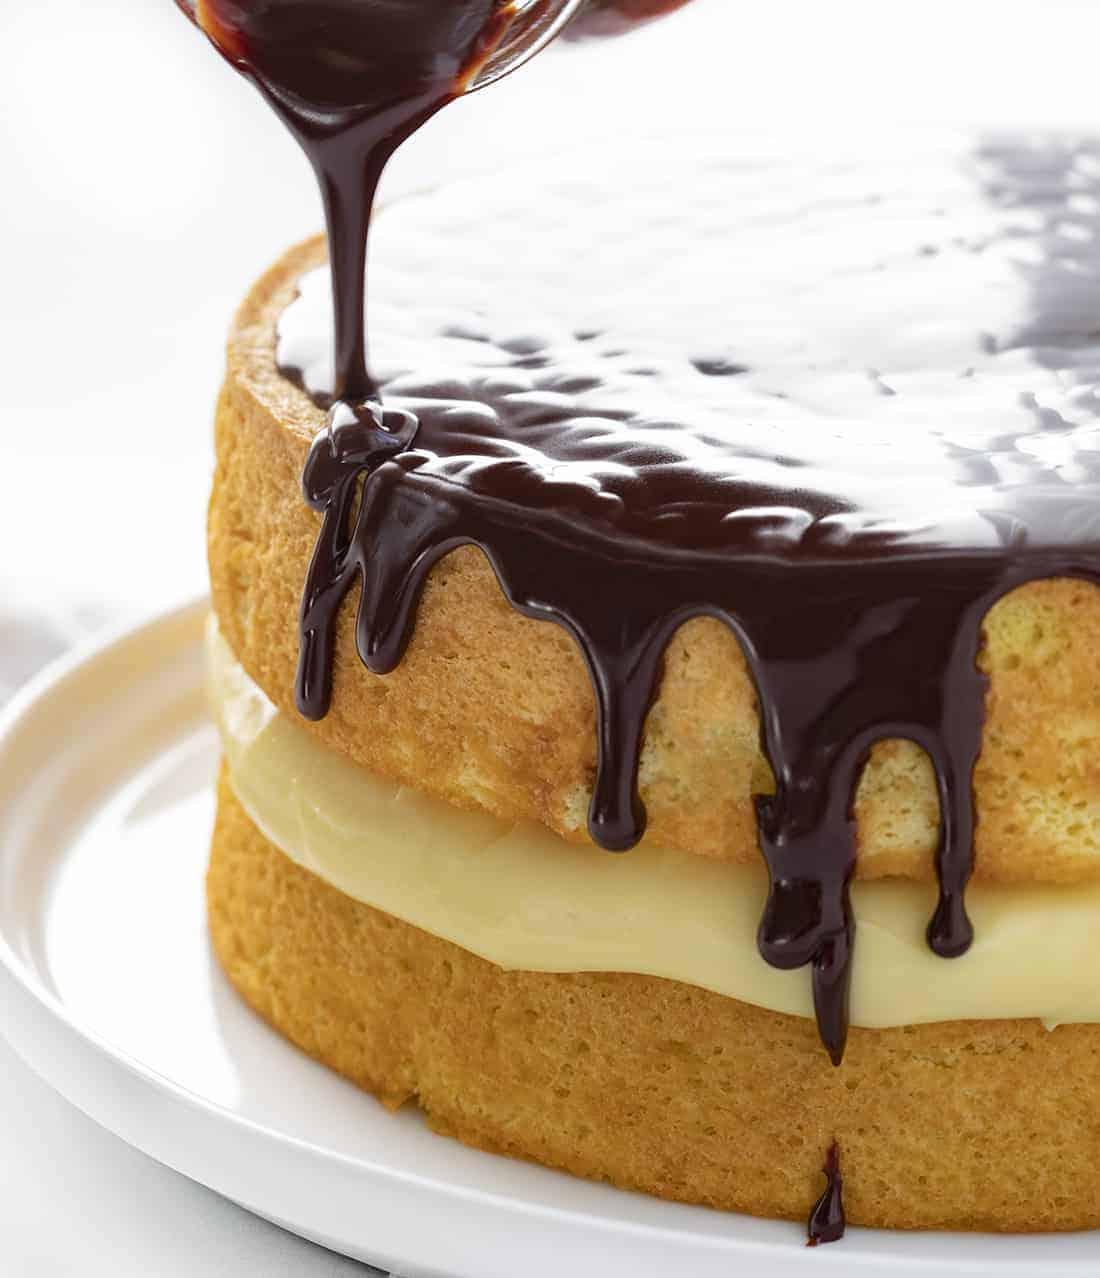 Poring Chocolate Over Boston Cream Pie